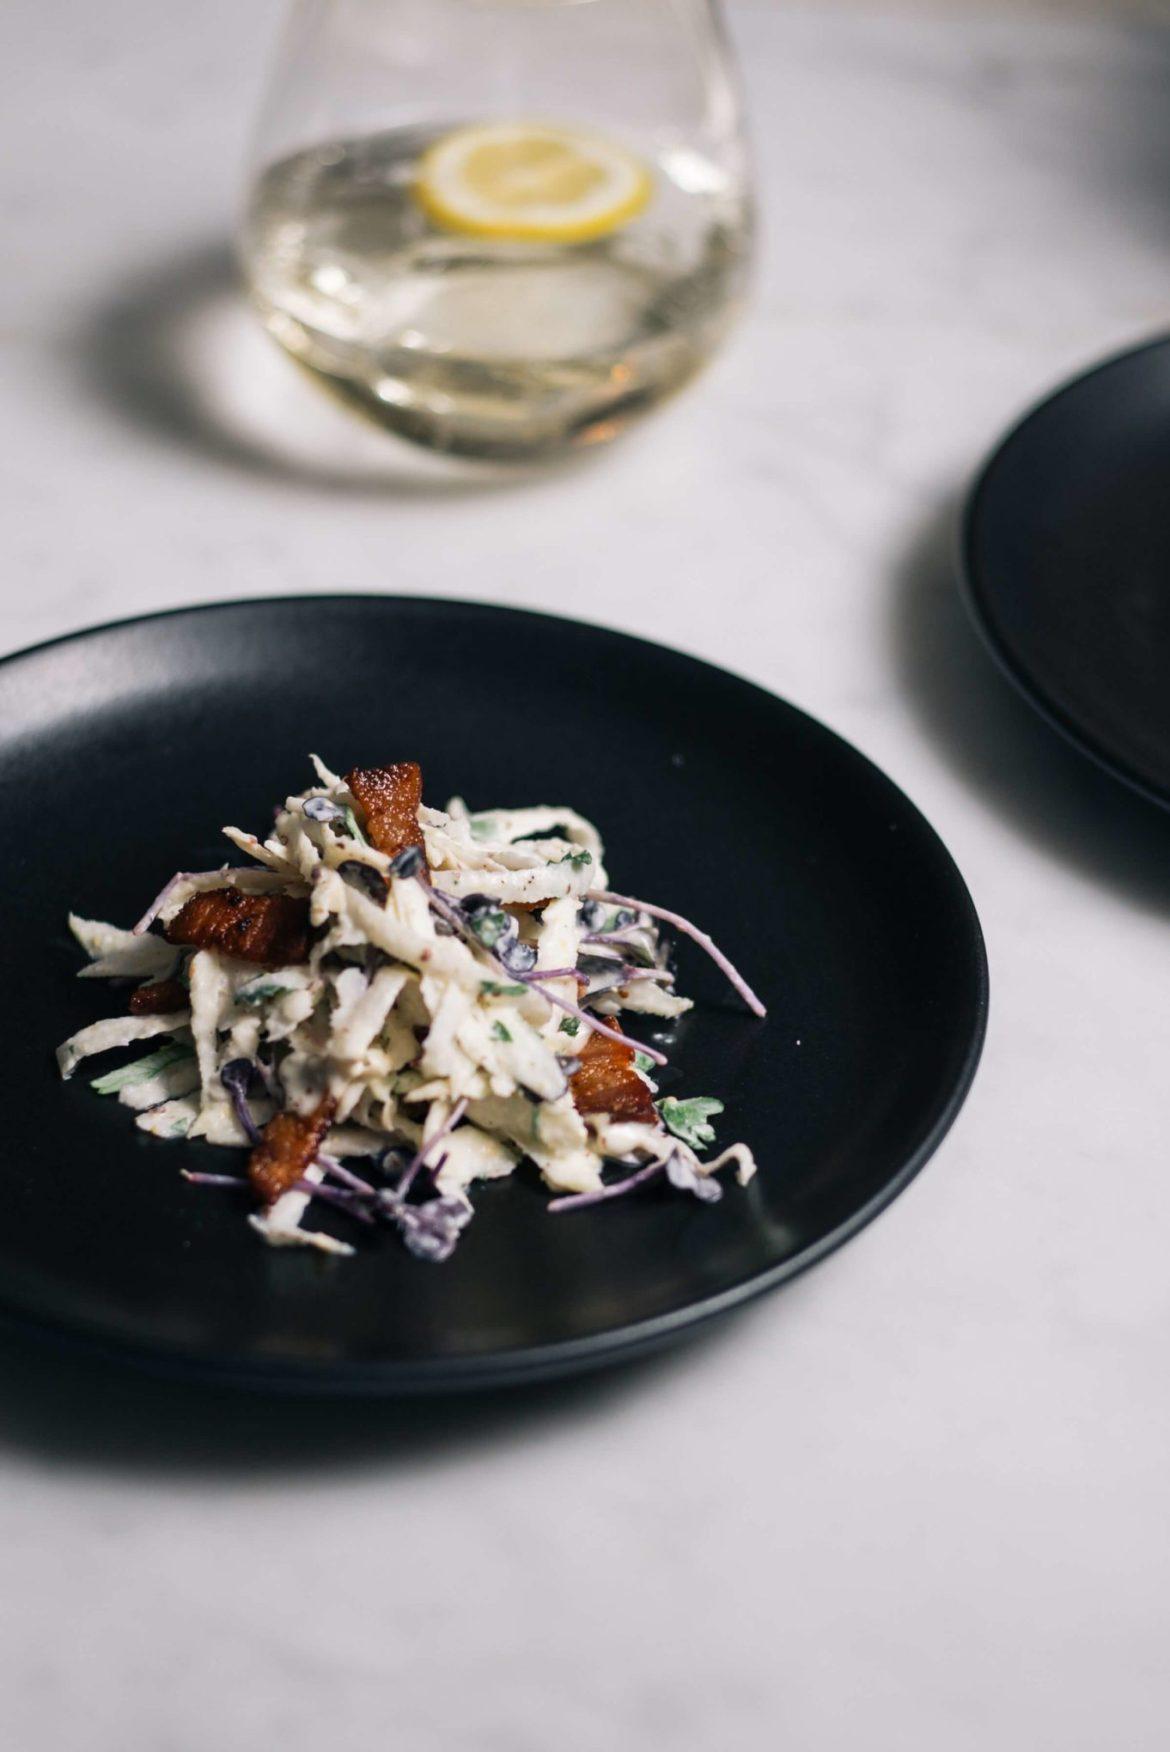 Celeriac and Bacon Salad made by the taste edit